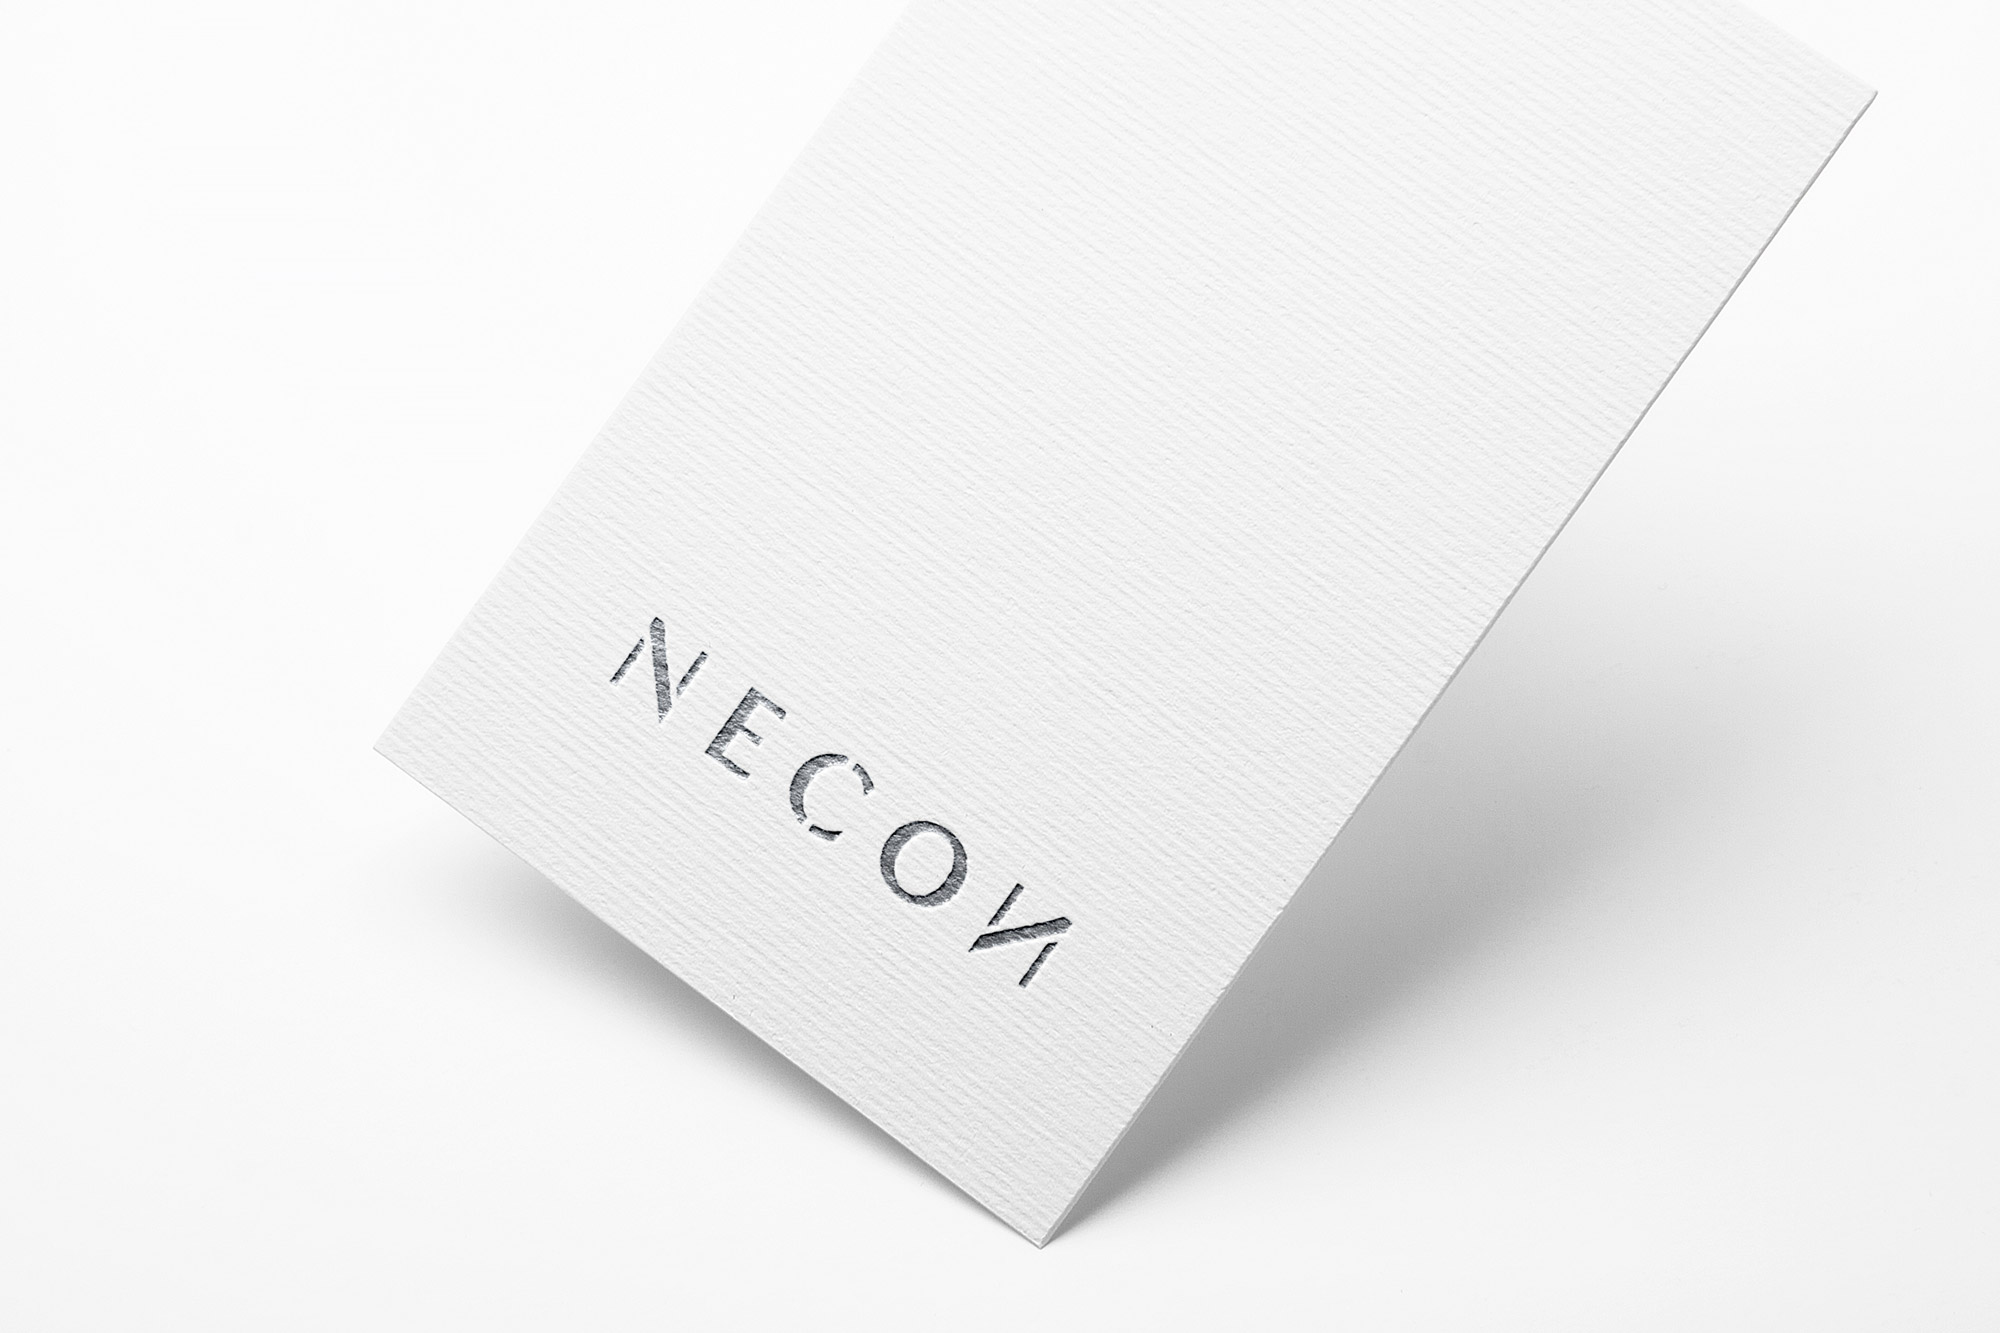 projekt logotyp minimalizm necon gdańsk